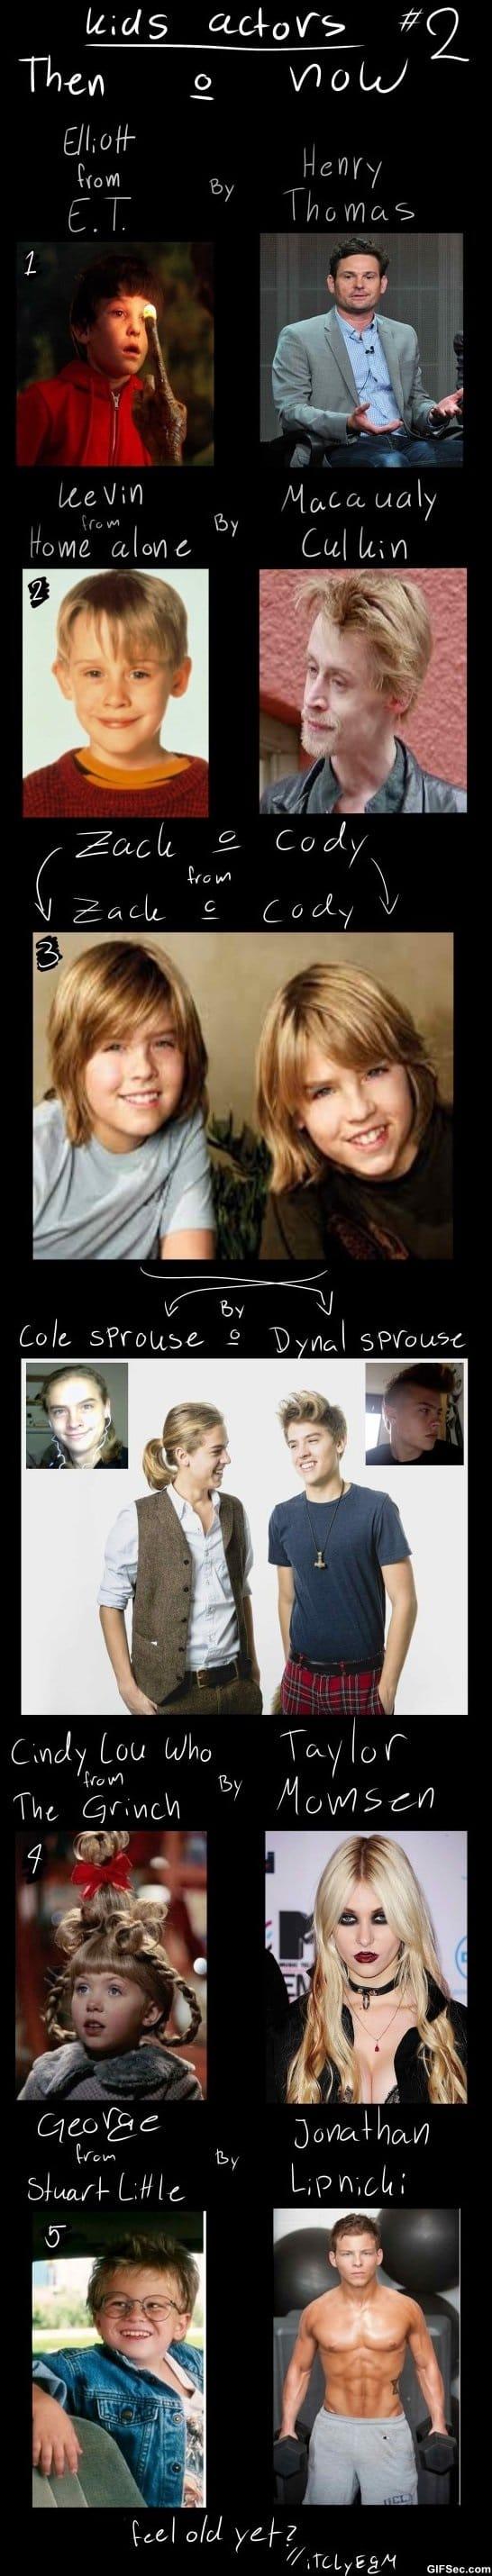 funny-pictures-kids-actors-then-vs-now